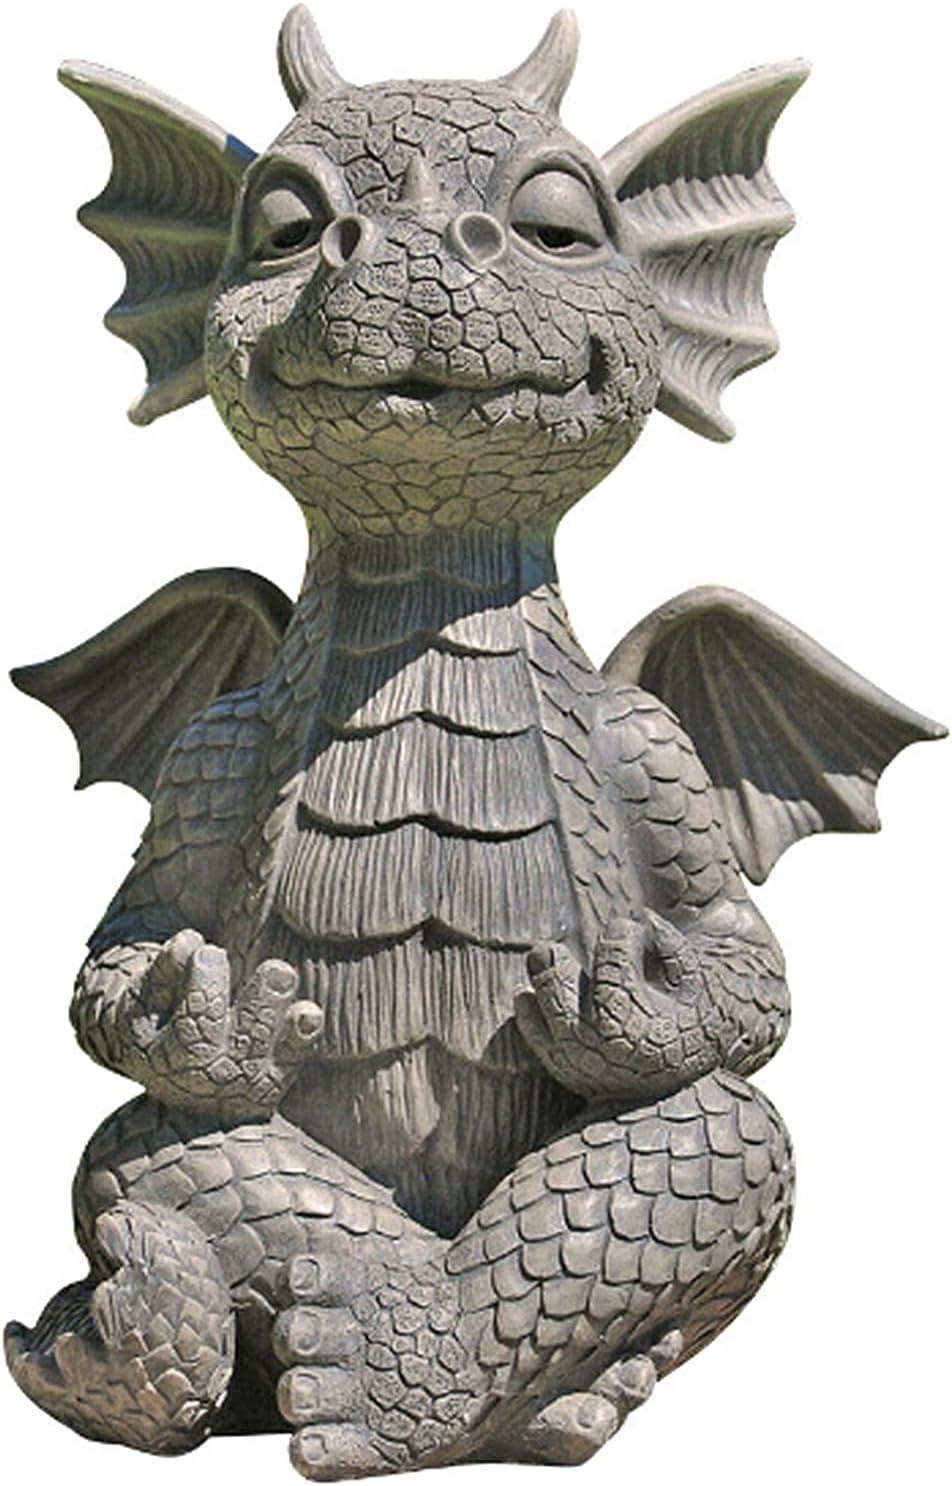 AKIIN Garden Dragon Statue, Funny Meditation Dragon and Figurines Holding Lamp Sleeping Zen Yoga Ornaments Outdoor Yard Outdoor Courtyard Resin Decoration Furnishings (Meditation)